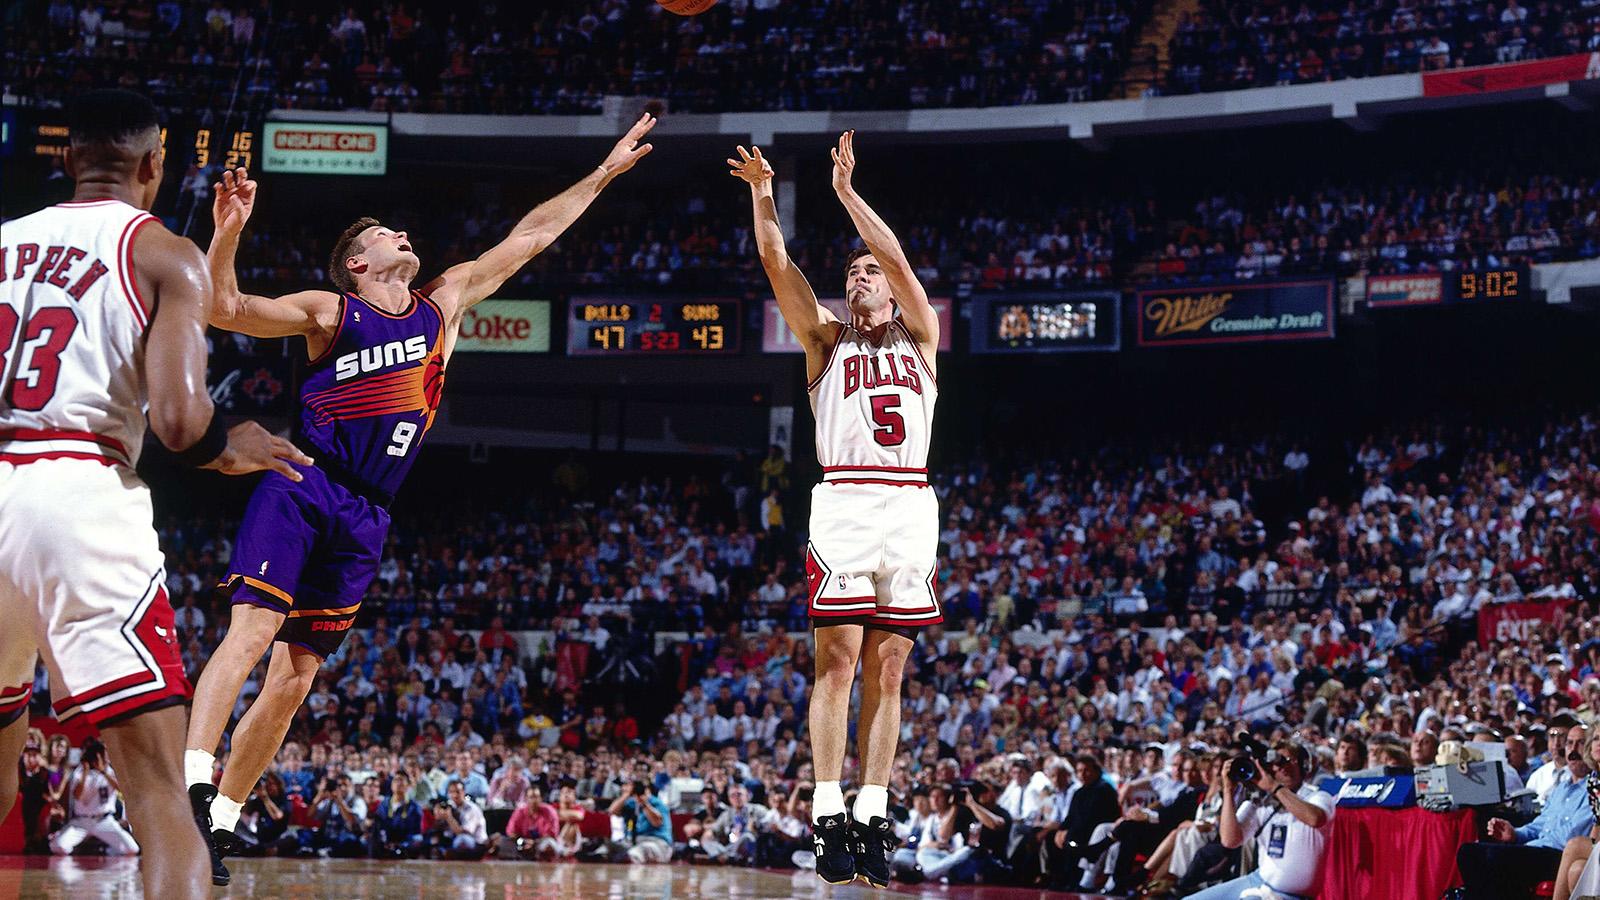 John Paxson in the 1993 NBA Finals